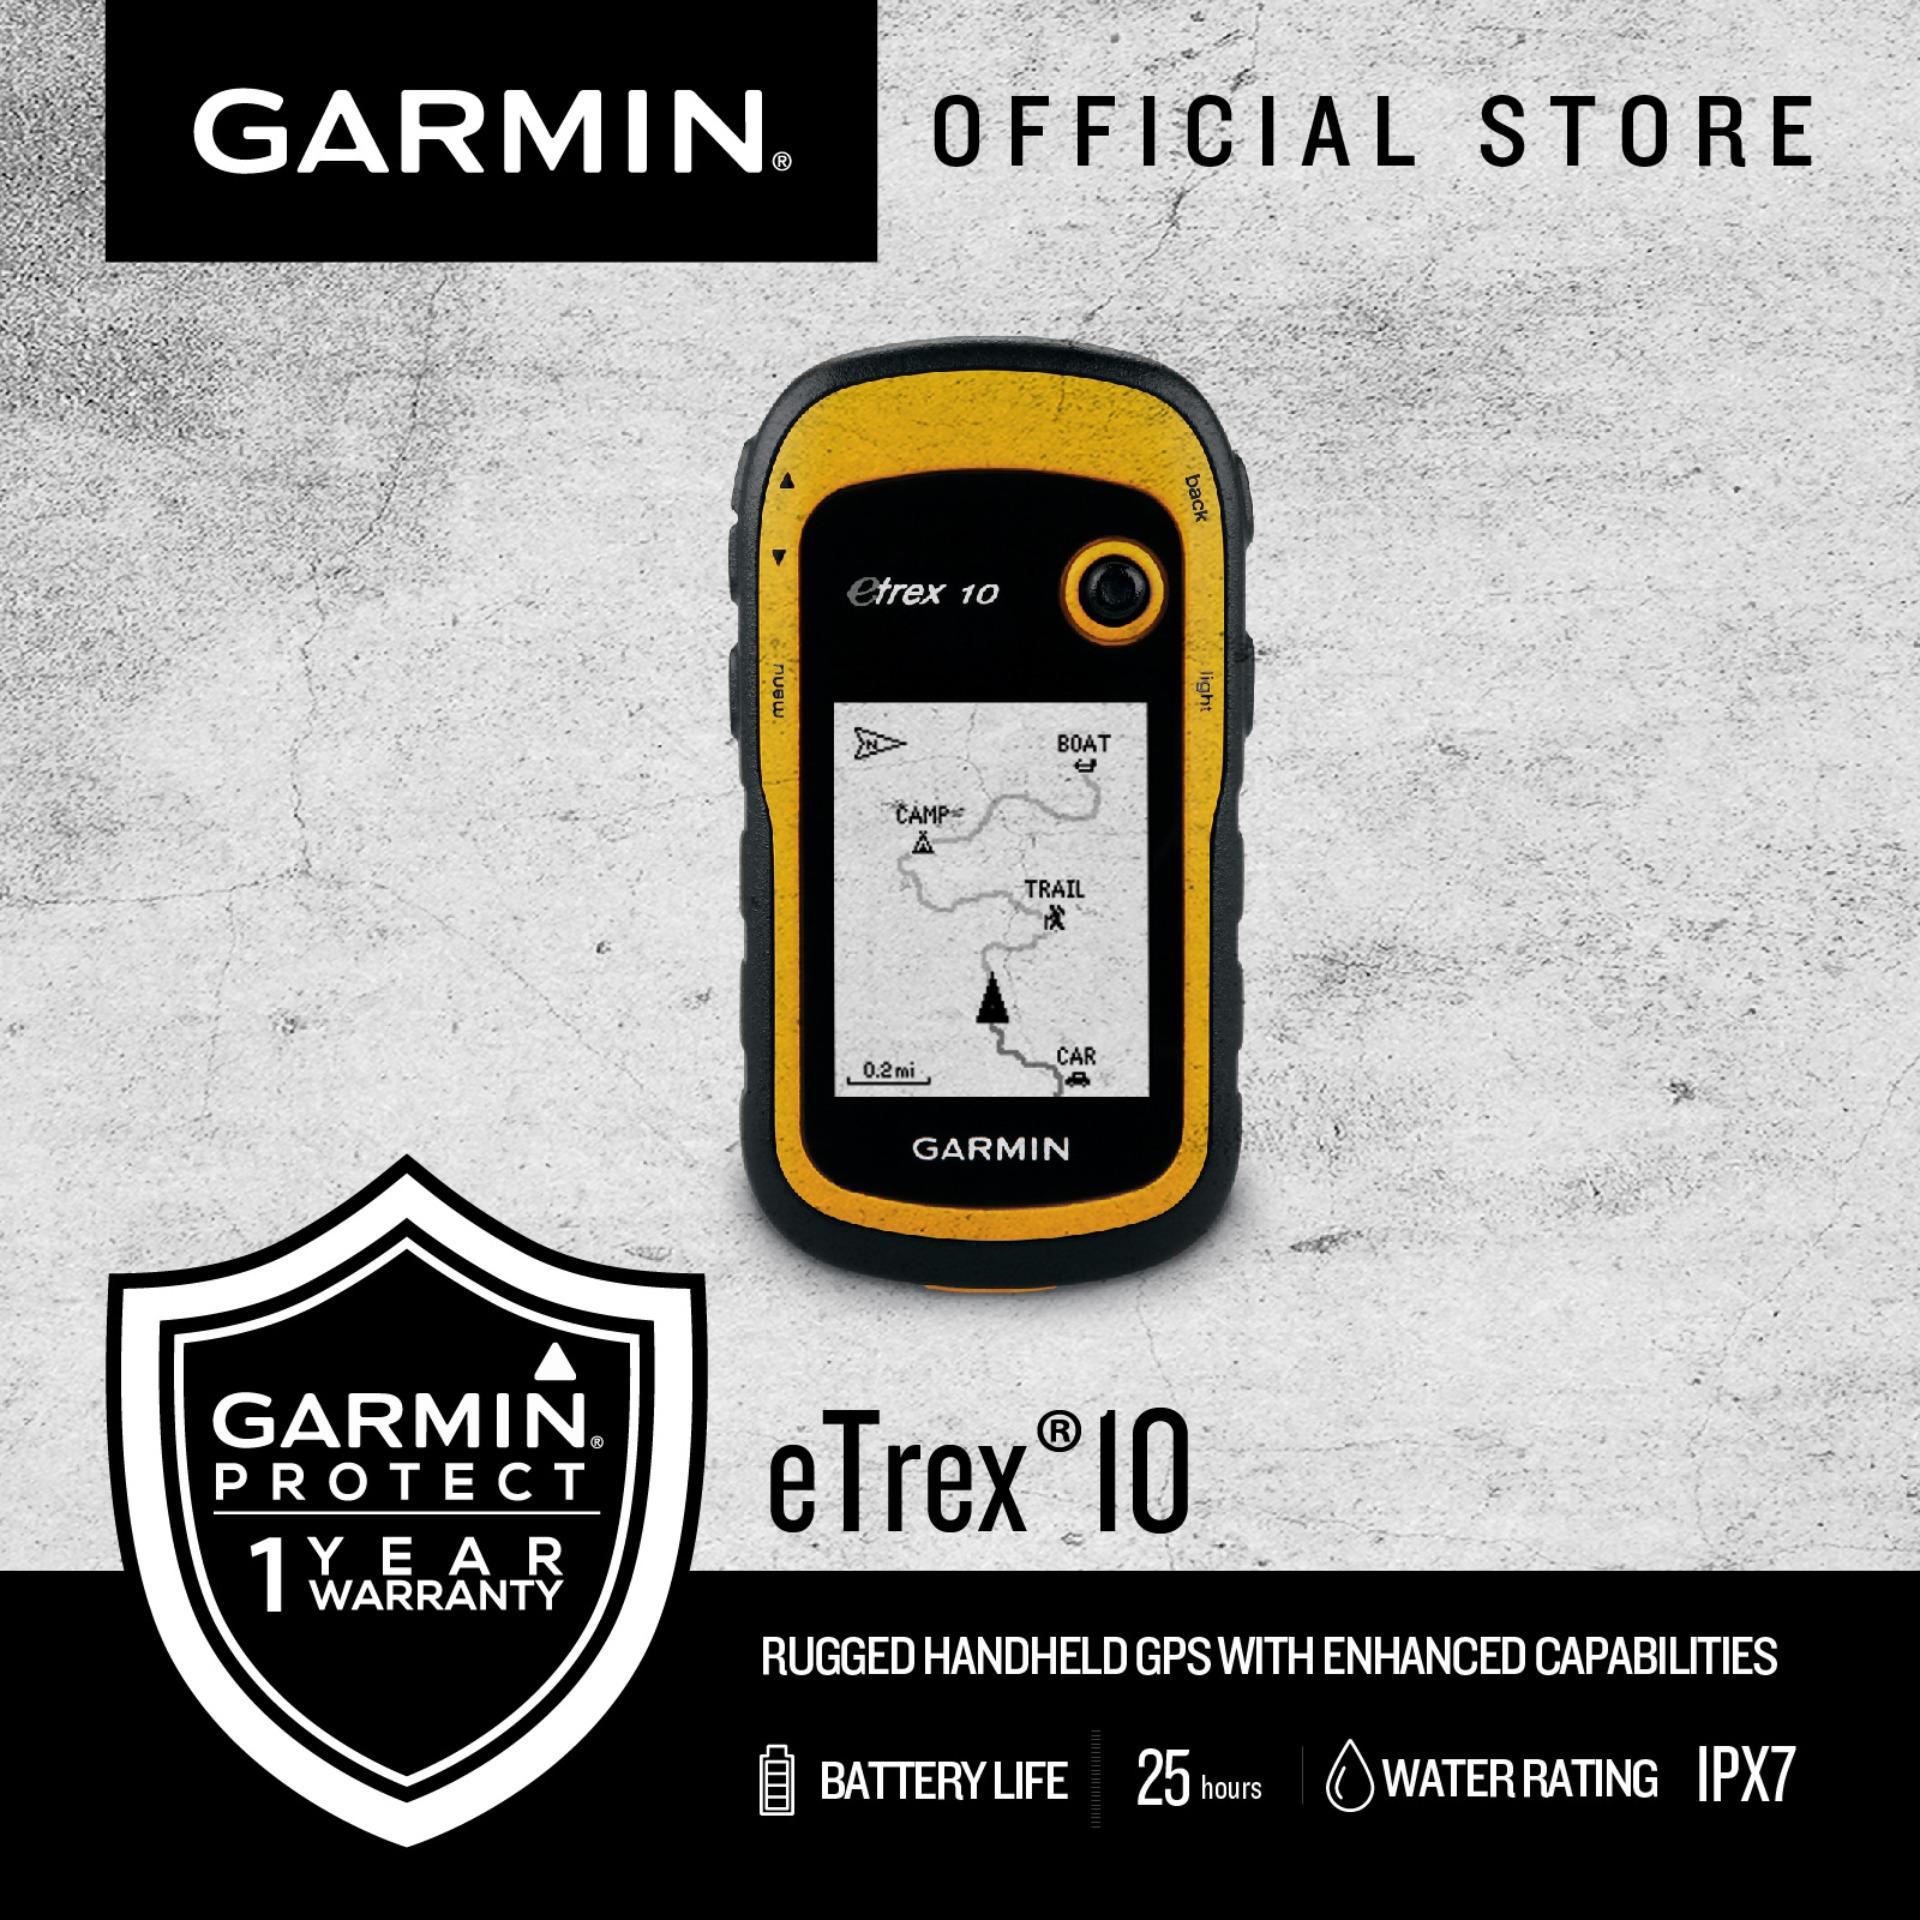 Garmin Philippines Price List Sports Watch Drive 51 Gps Mobil Touchscreen Etrex 10 Rugged Handheld With 12 Months Warranty